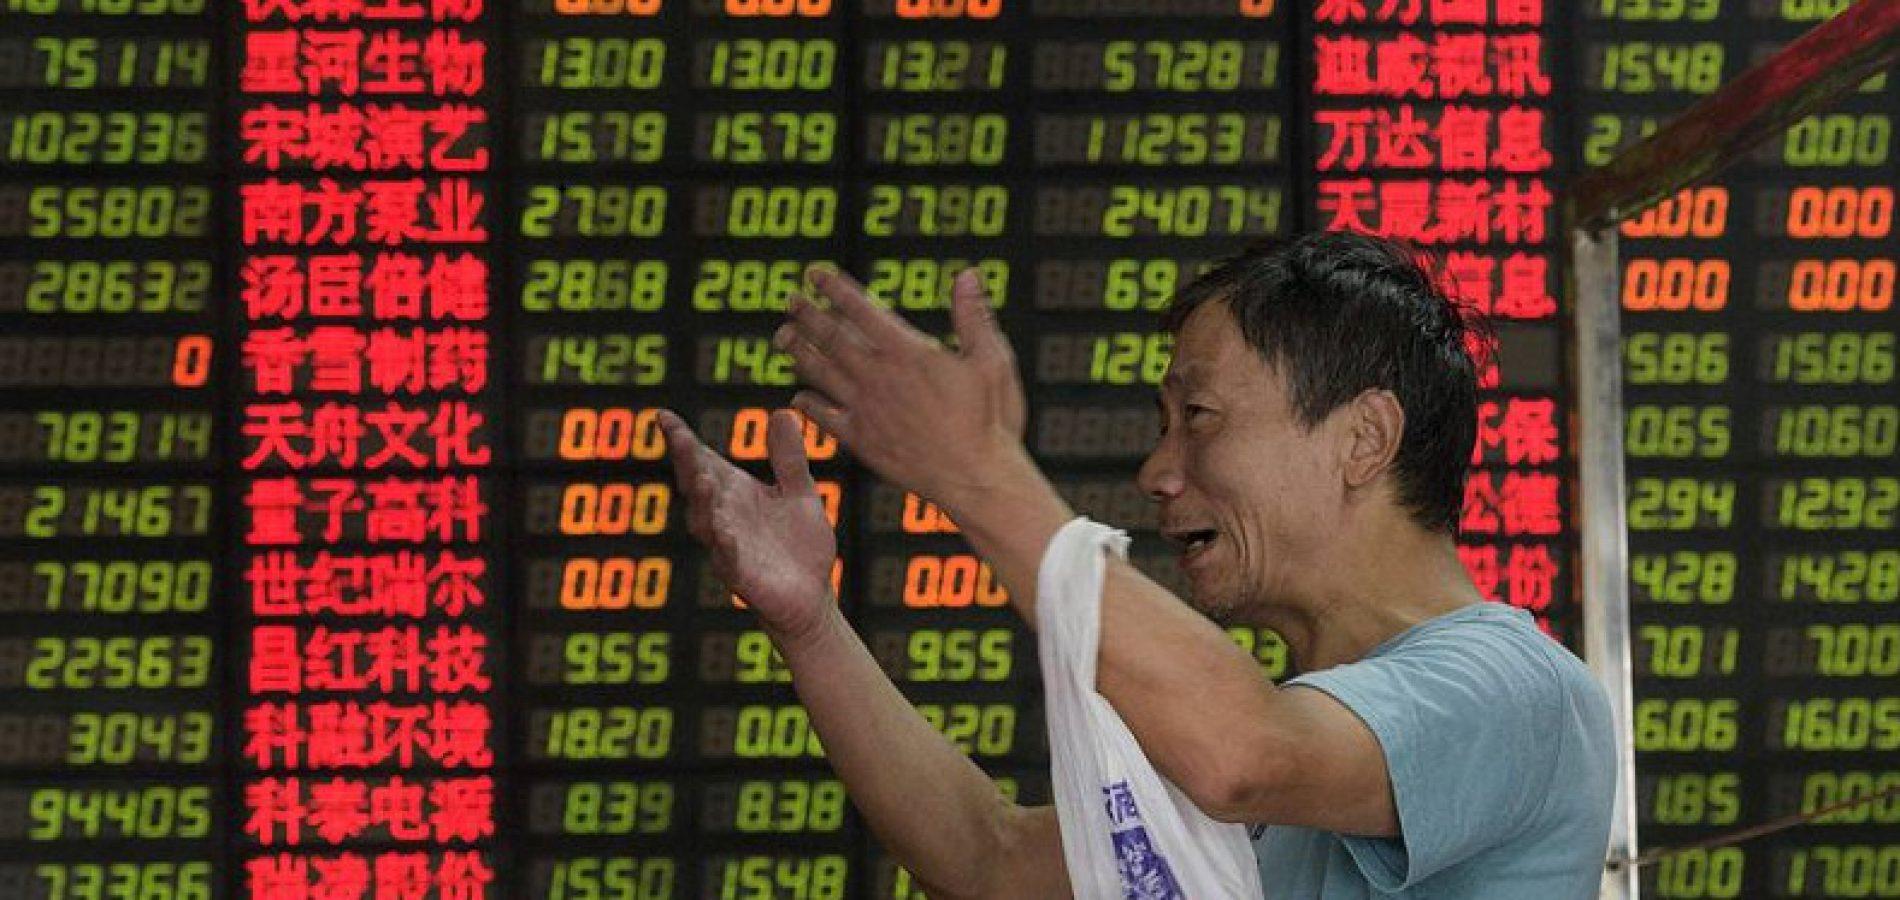 Azijske berze: Blagi dobitci na berzama, turska lira opet slabi